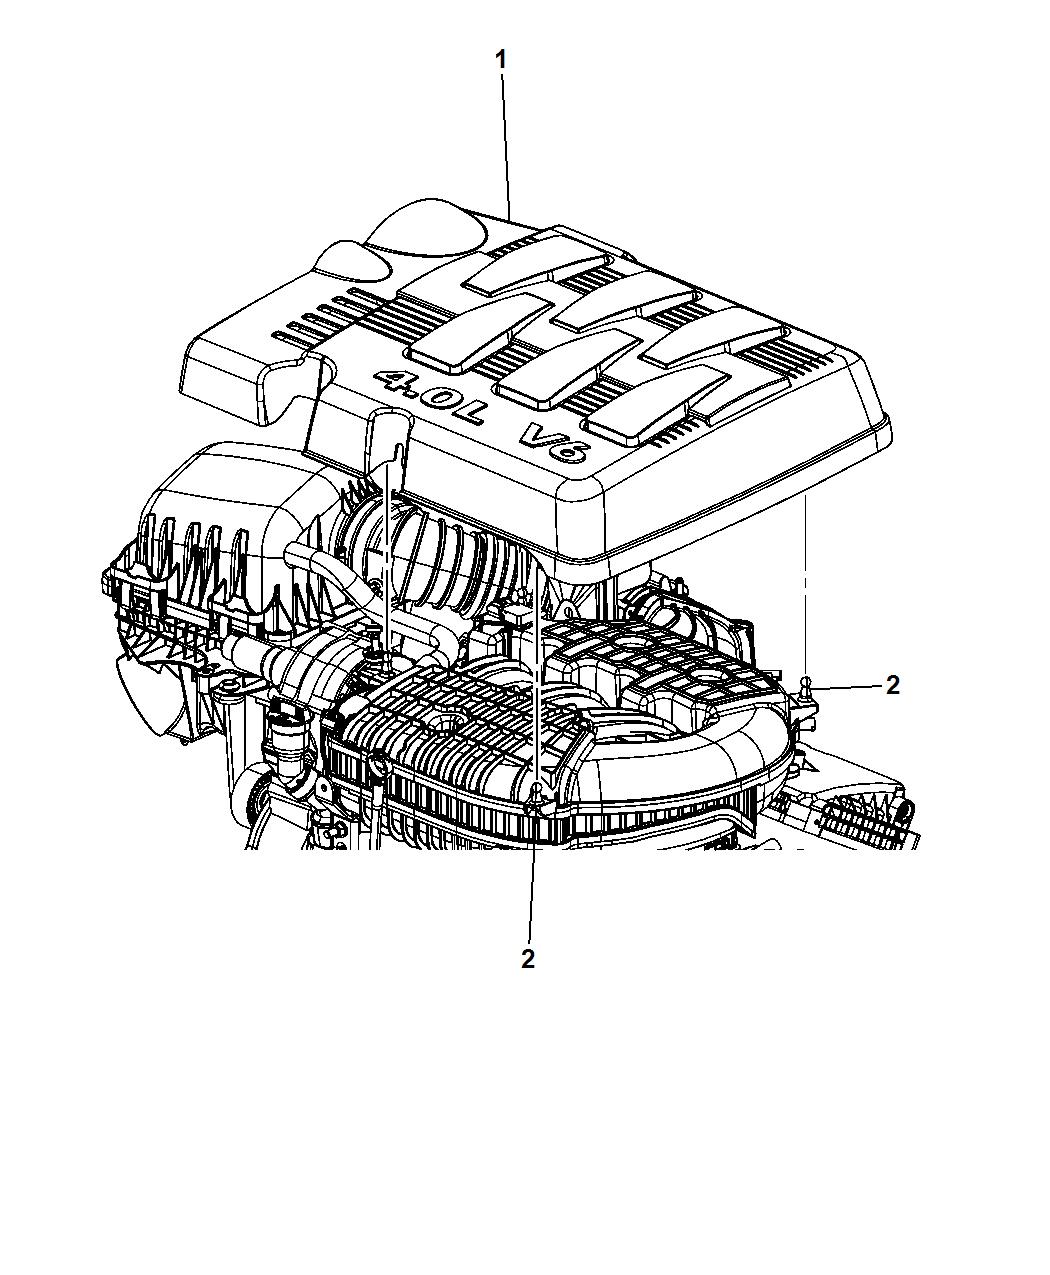 [WLLP_2054]   TD_6079] 2008 Chrysler Town And Country Engine Diagram Schematic Wiring | 2010 Chrysler Engine Diagram |  | Inama Eopsy Ynthe Arivo Bepta Mohammedshrine Librar Wiring 101